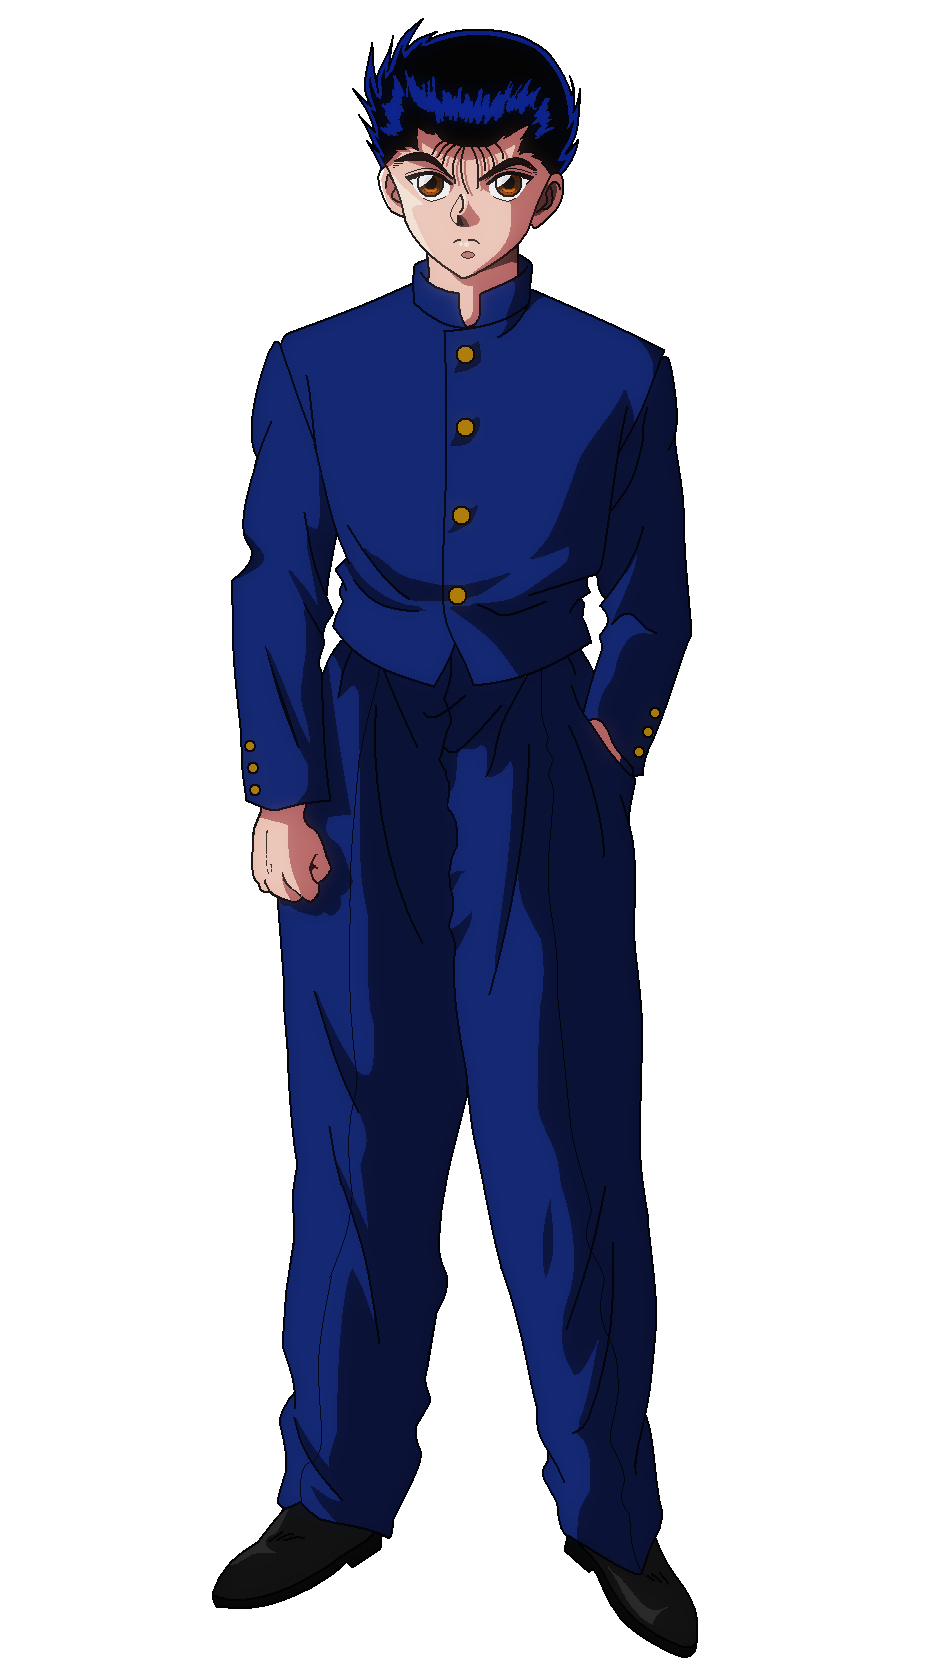 Character Yusuke School Uniform Winter Png 940 1671 Yu Yu Hakusho Anime Japanese Movie Character